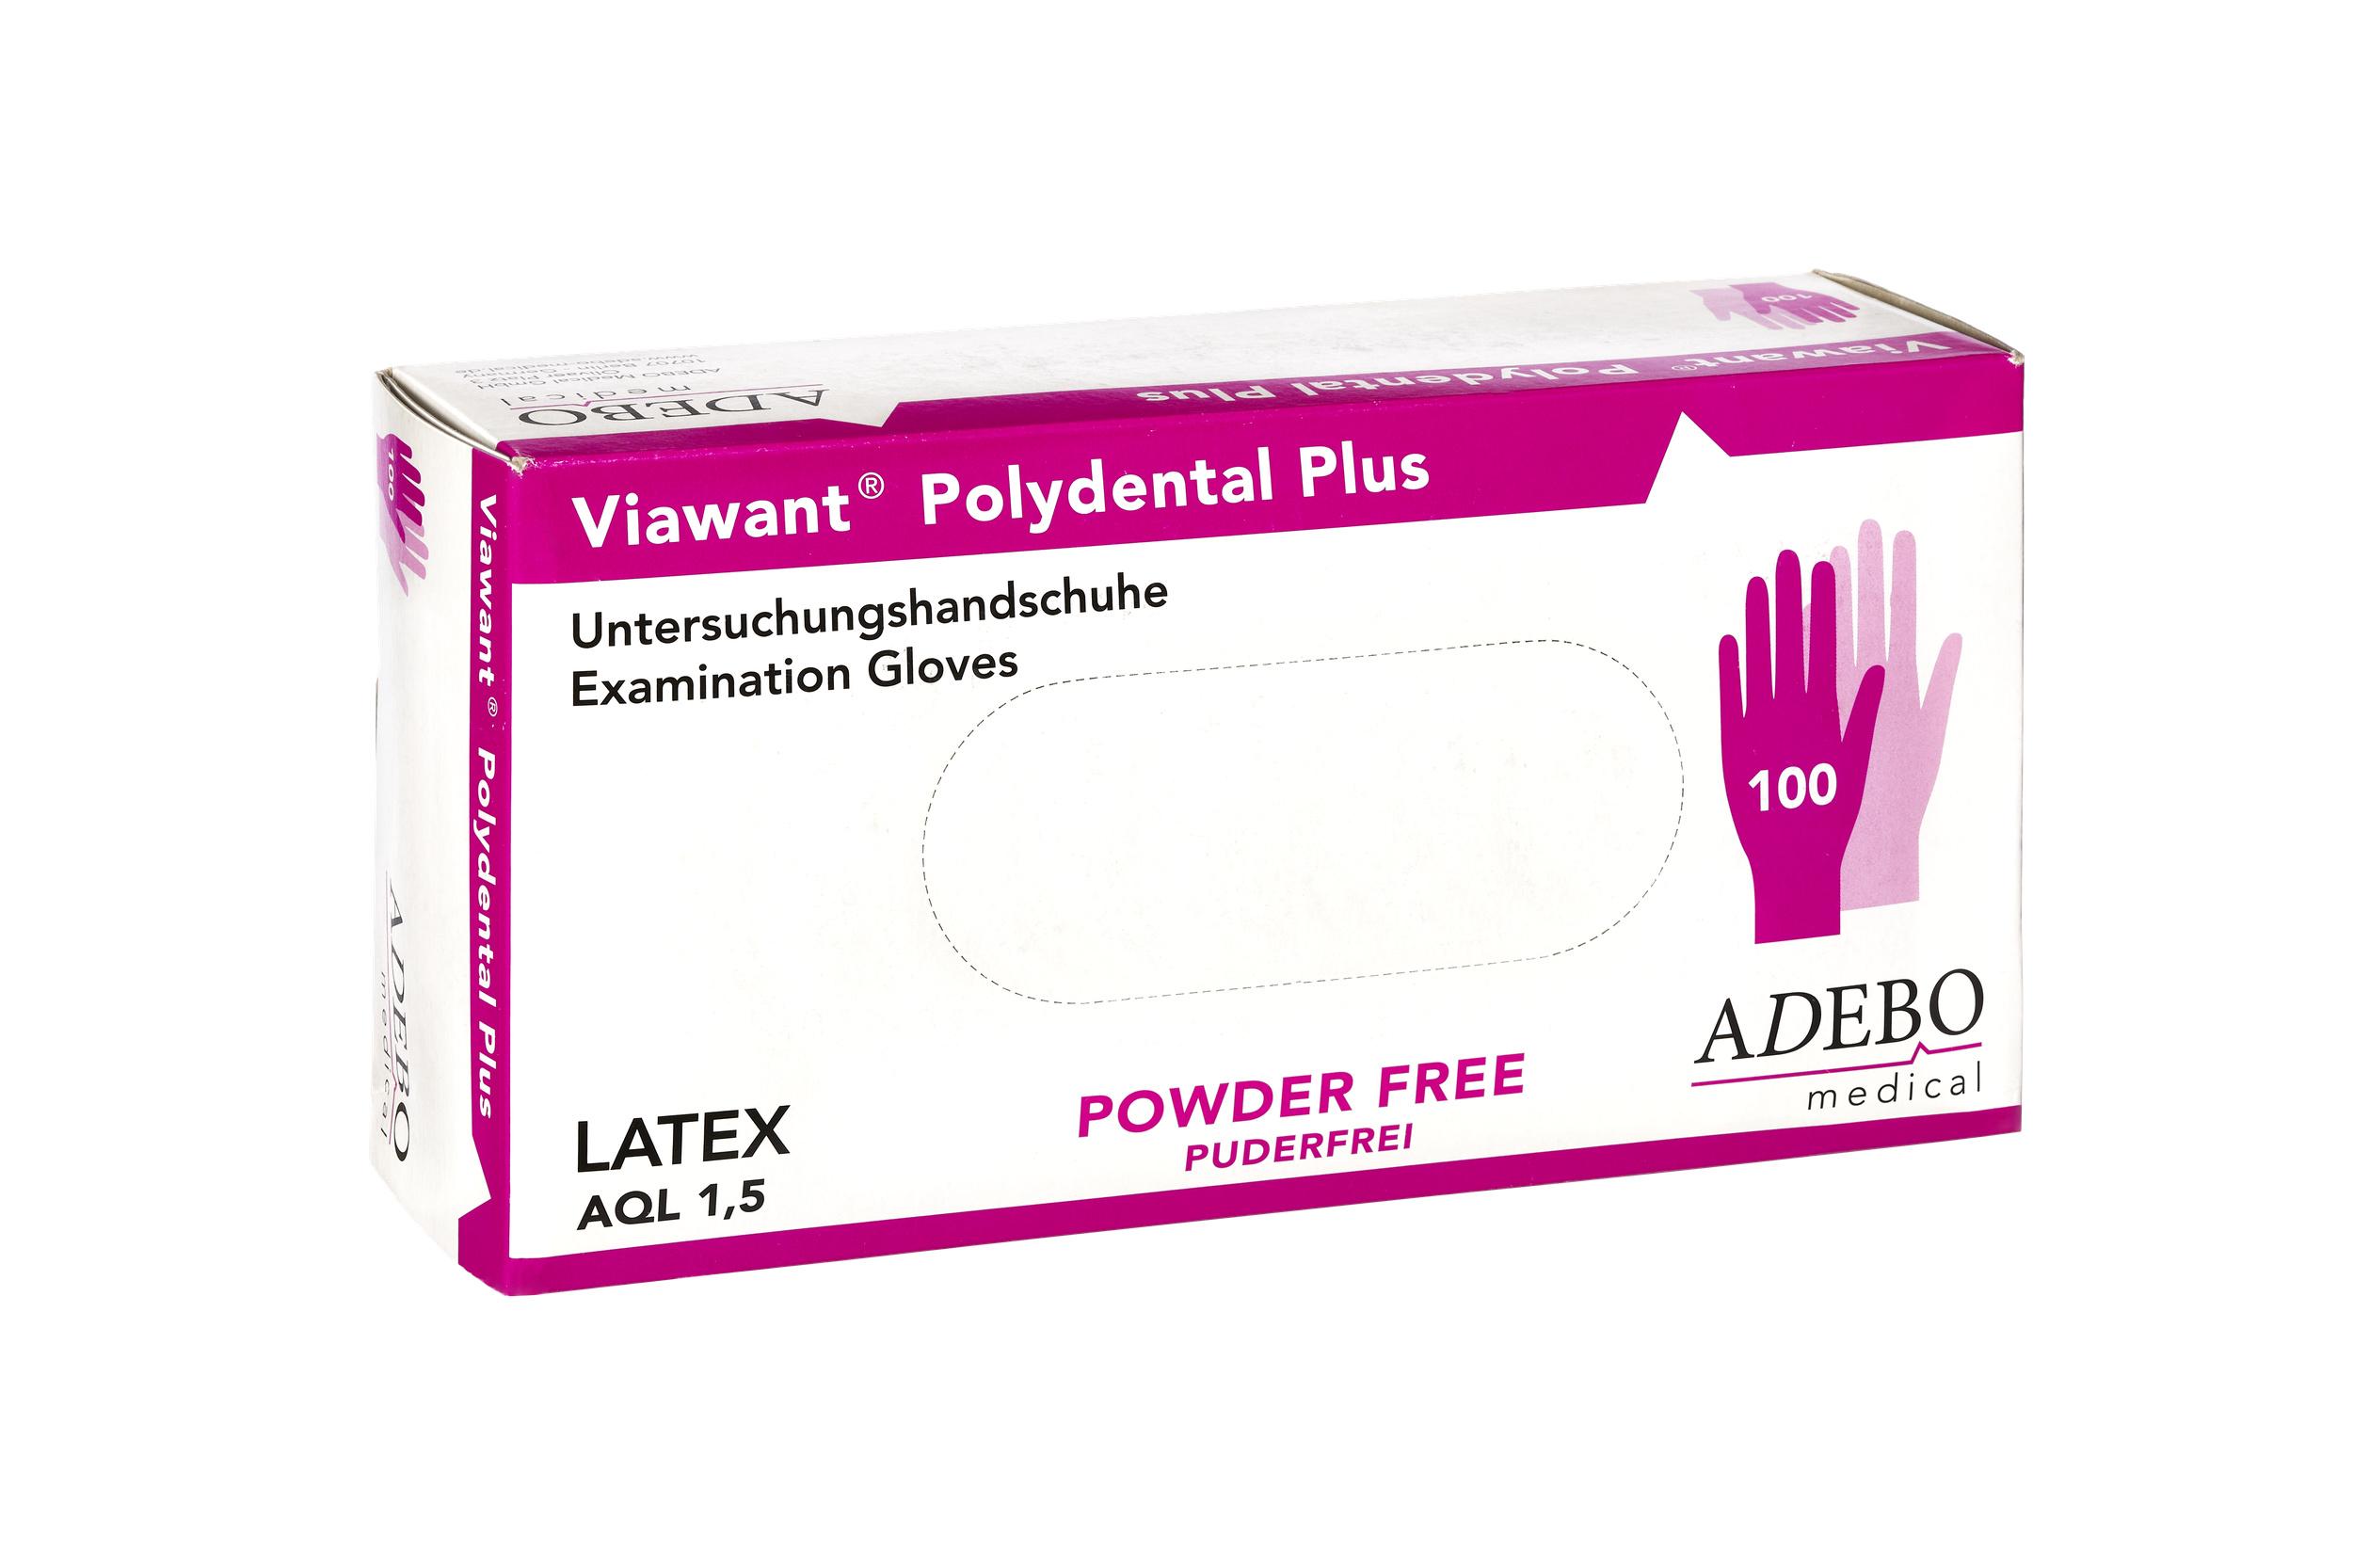 Viawant Polydental Plus - Einmalhandschuhe aus Latex